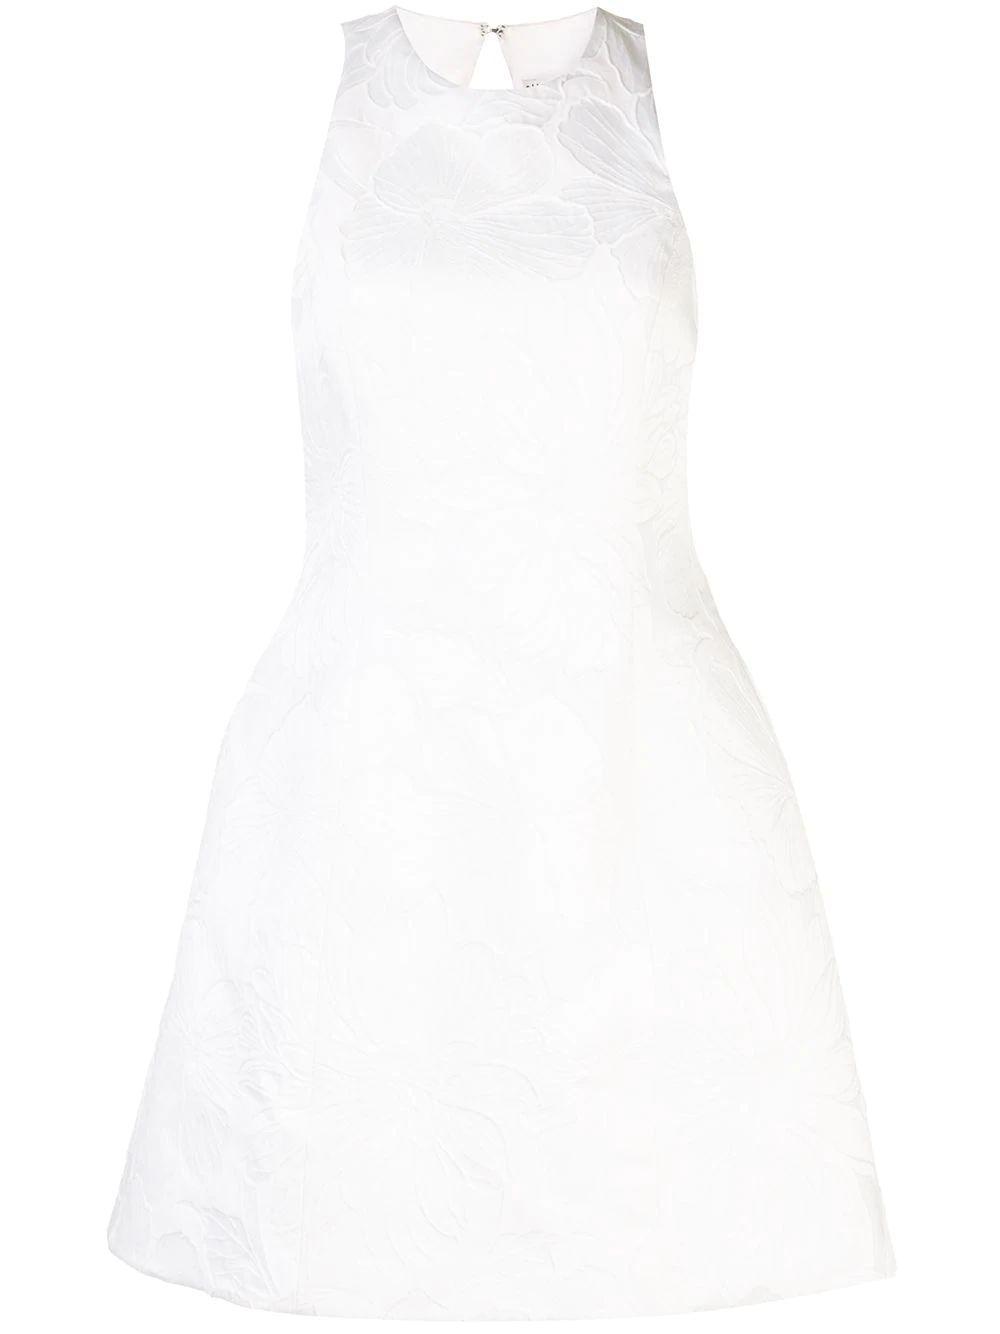 Coralia Lantern Dress With Open Back Item # CC003Q01545